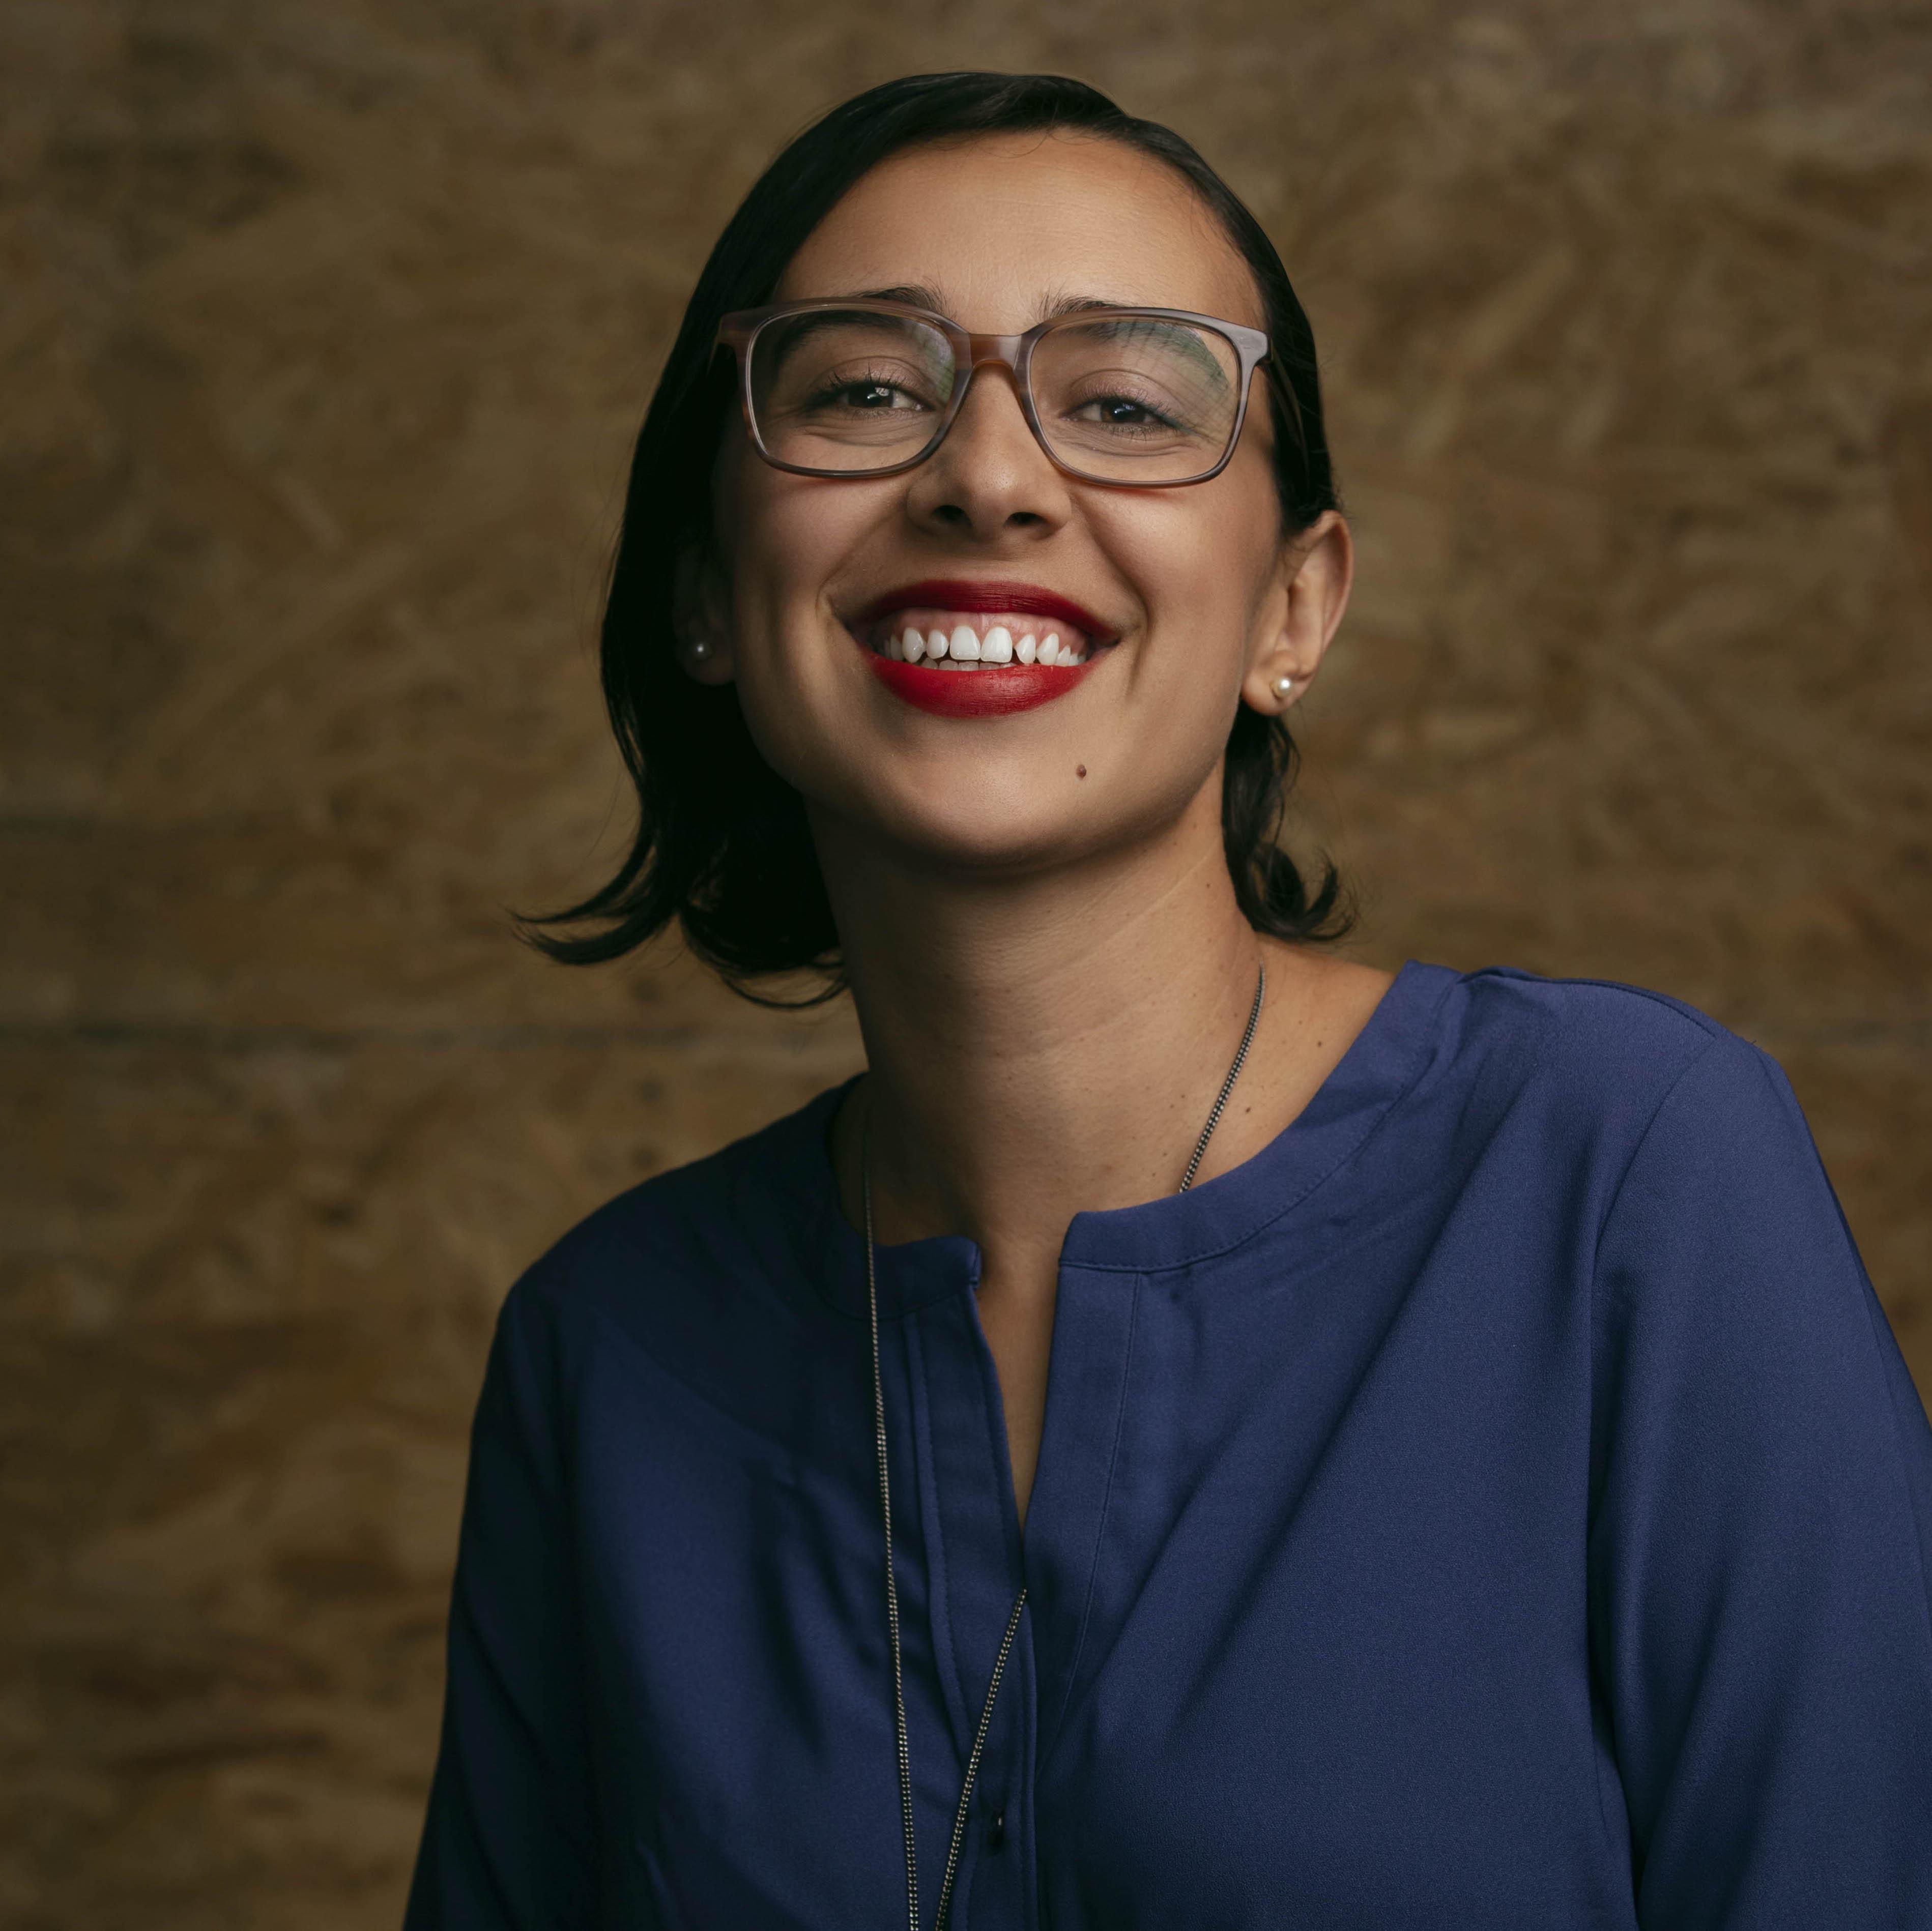 Cristina Vindas Rodríguez